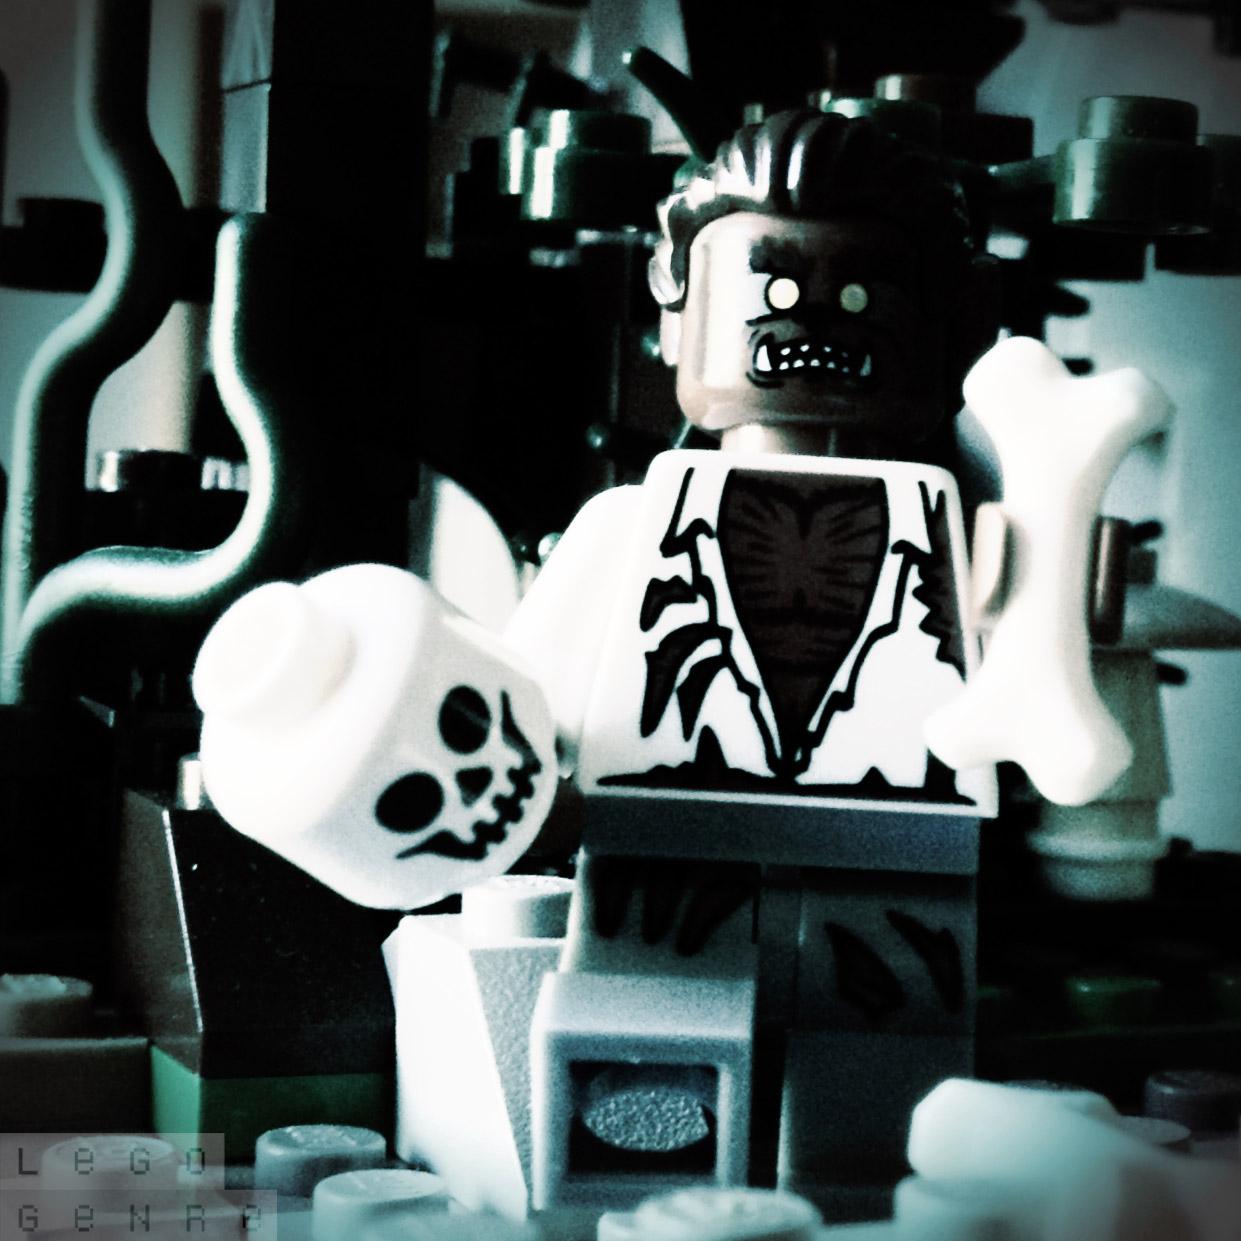 LegoGenre 00297: Lycanthrope Cravings